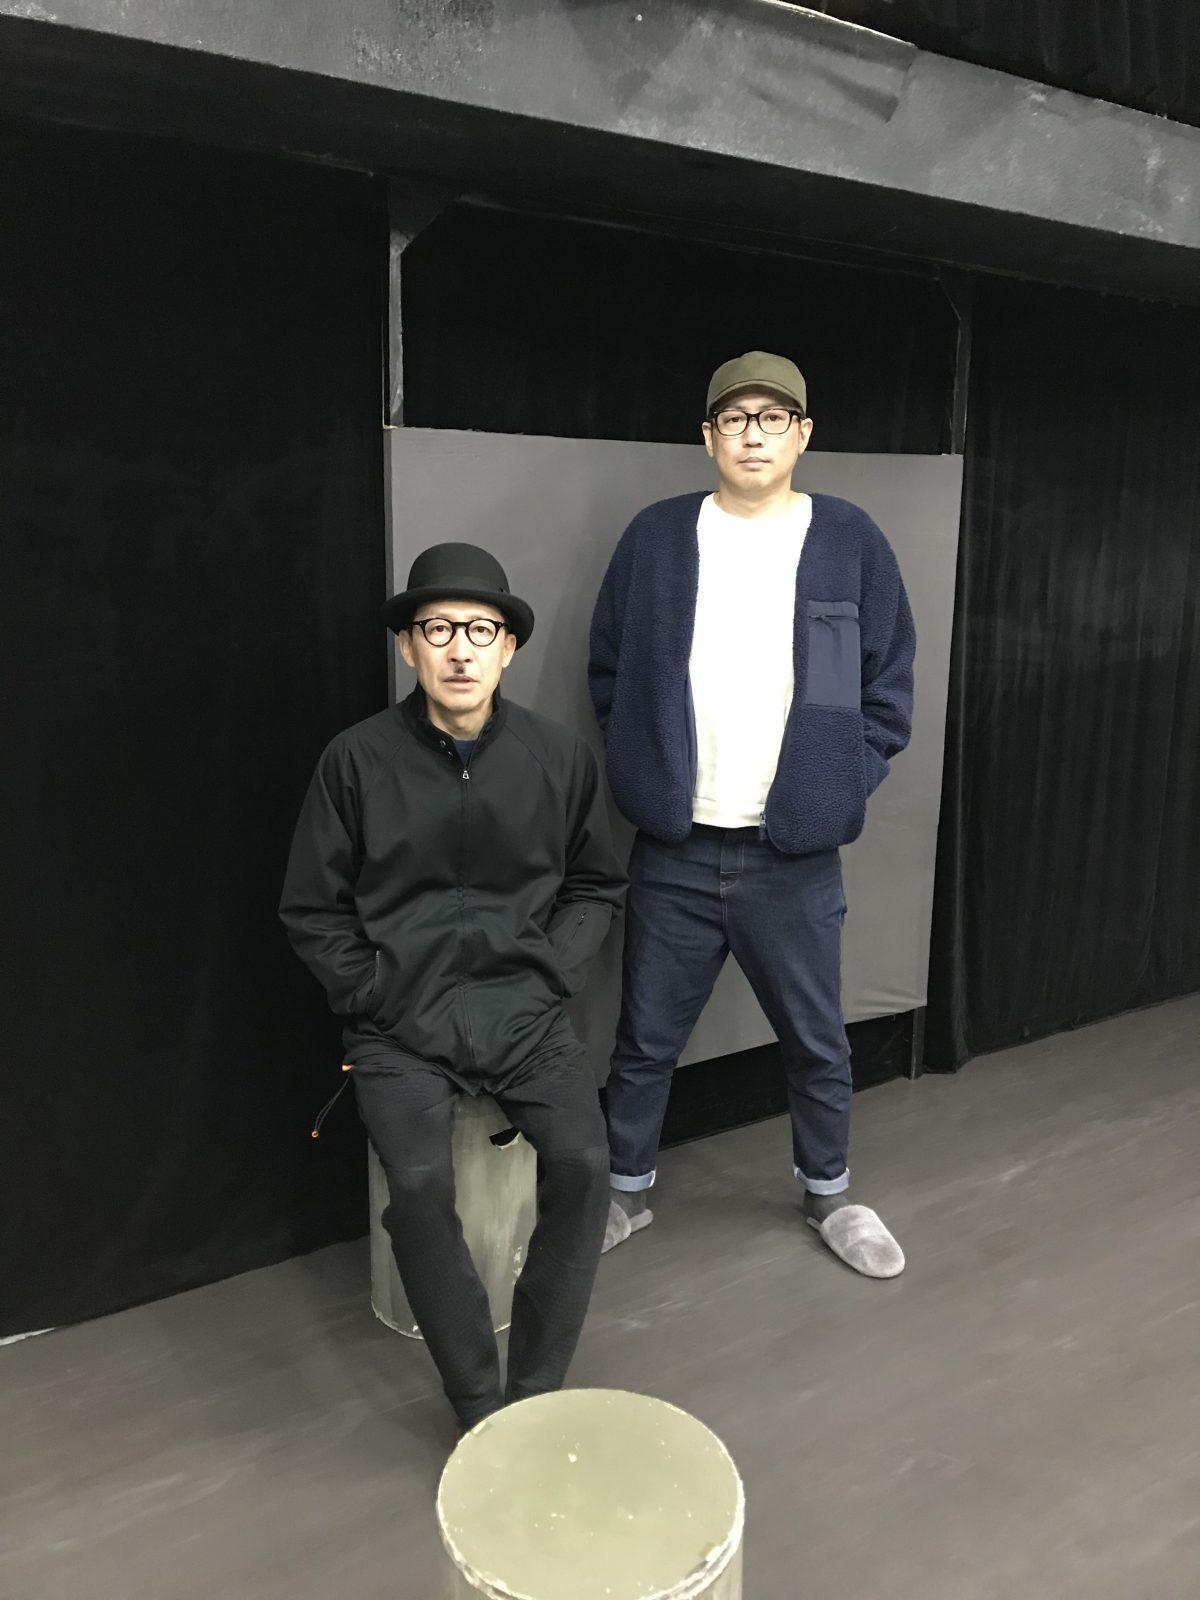 2019/12/16